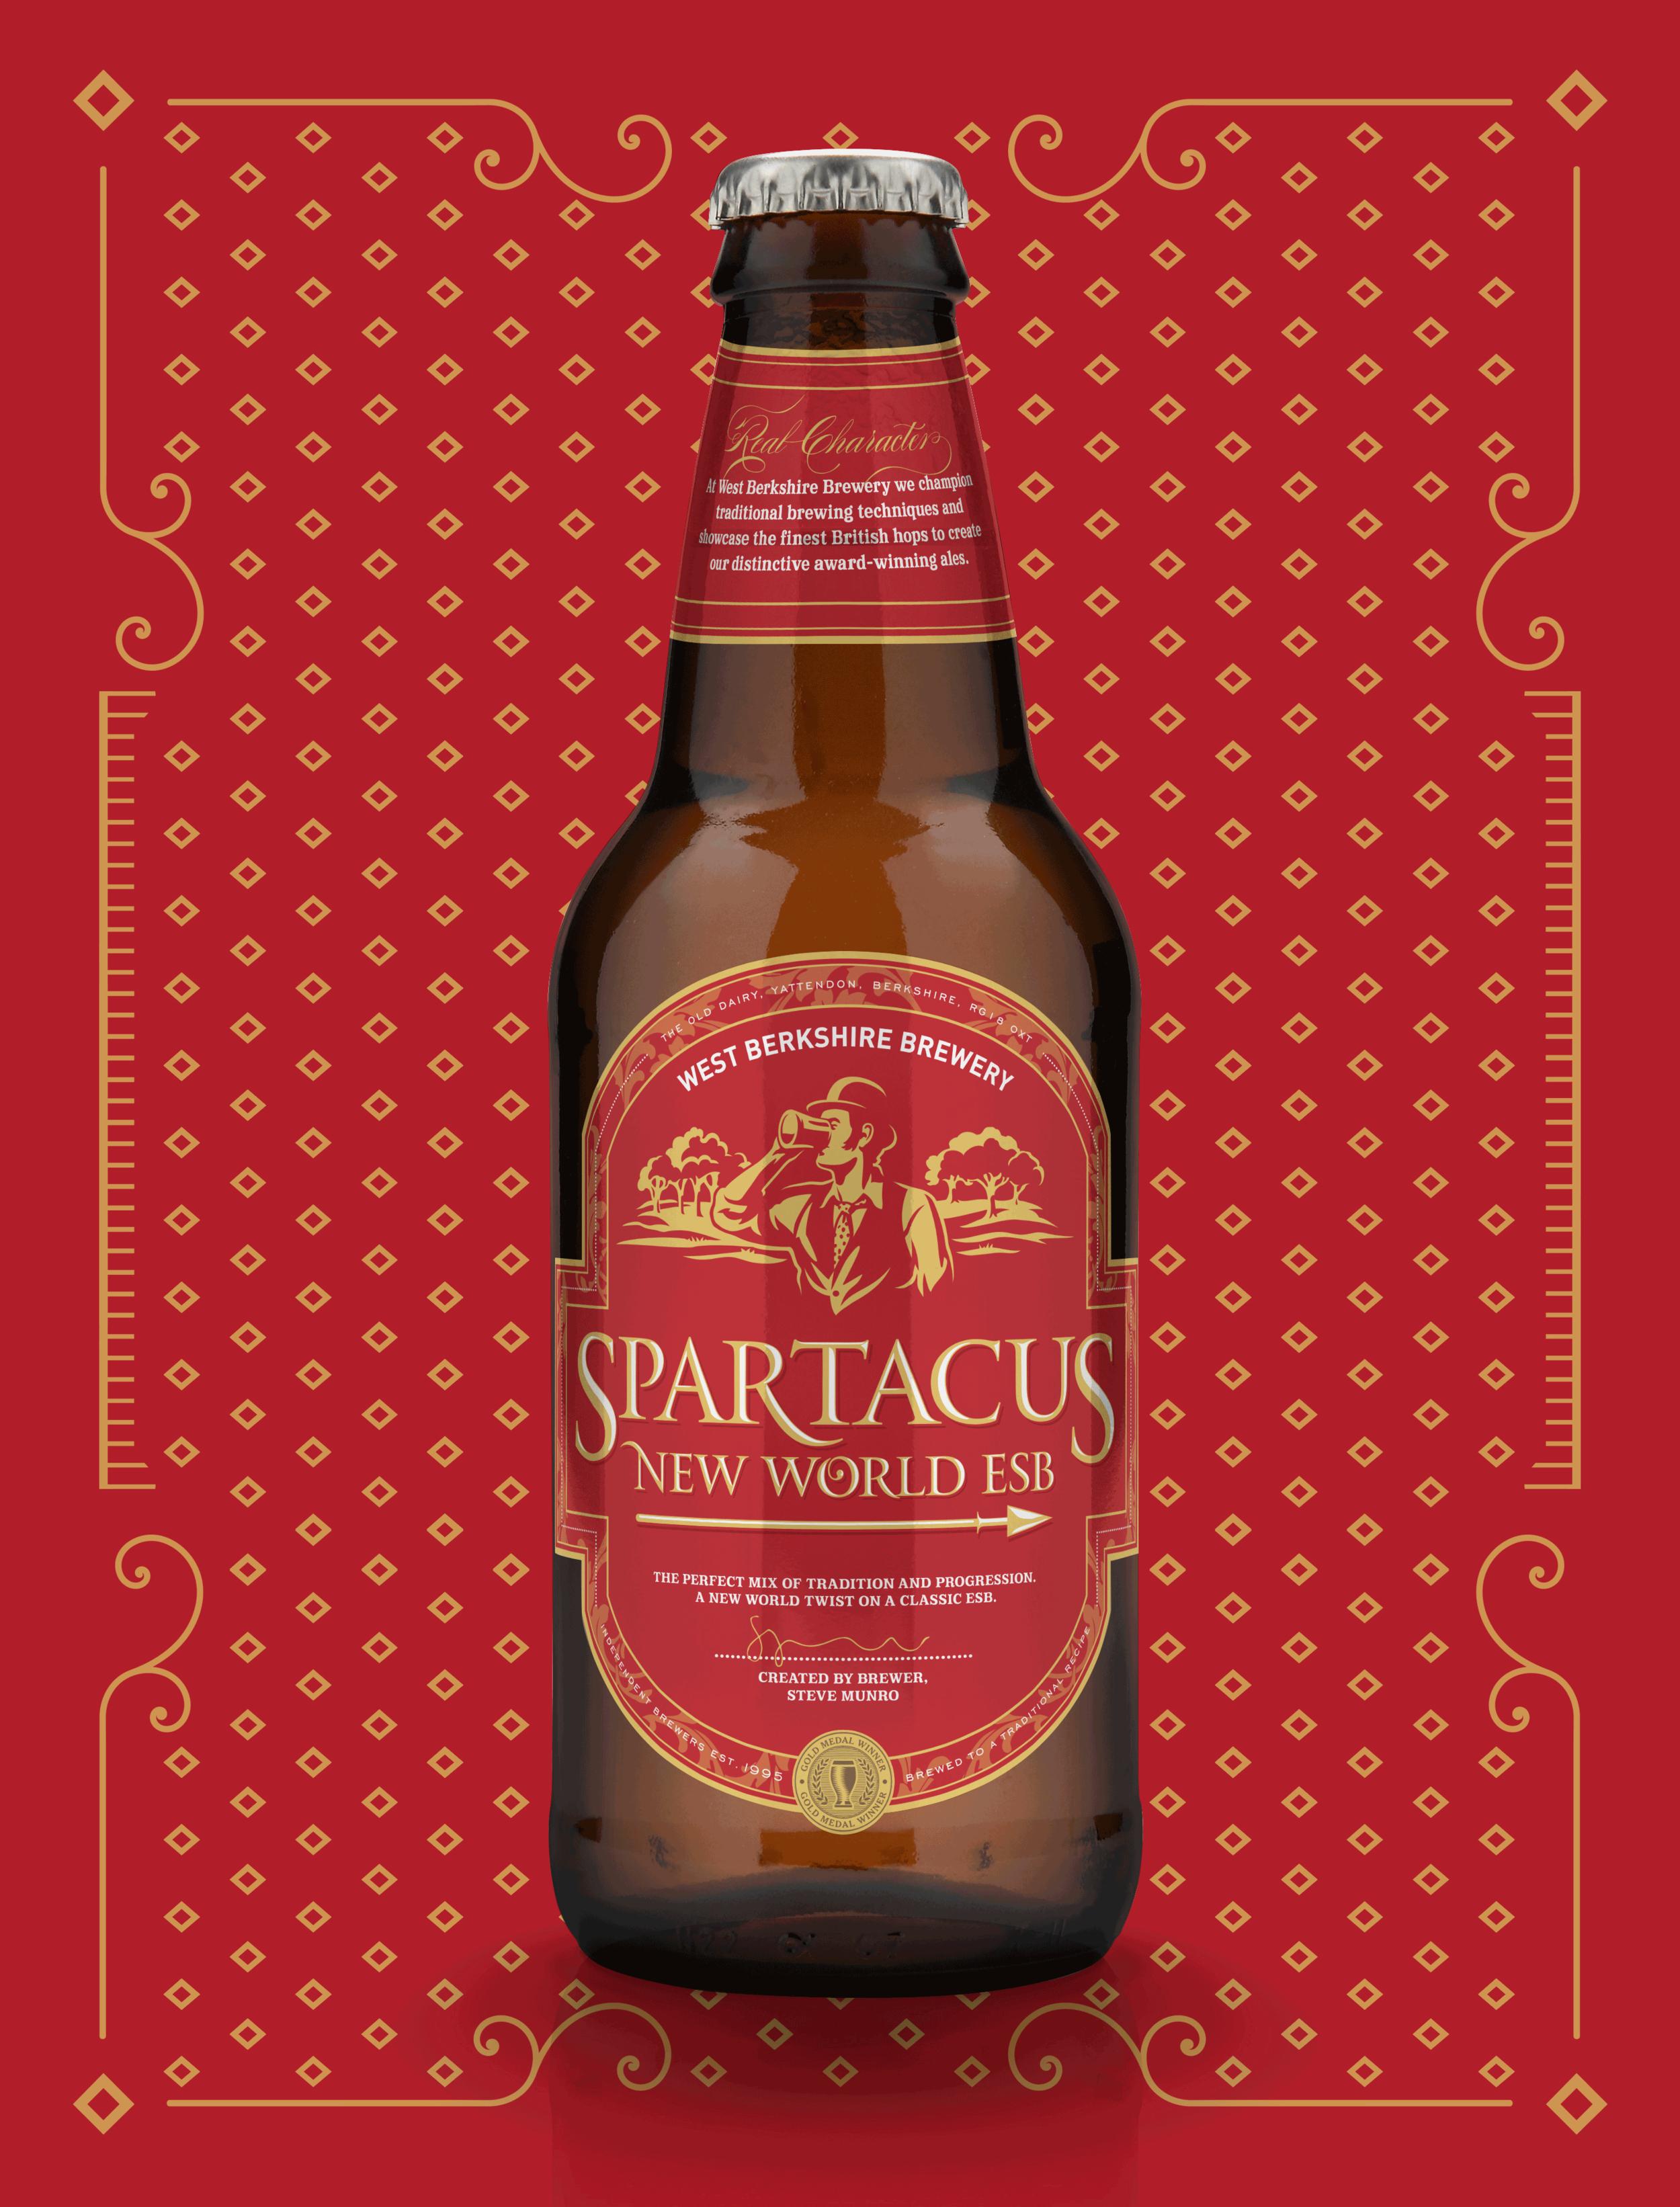 Spartacus_01.png